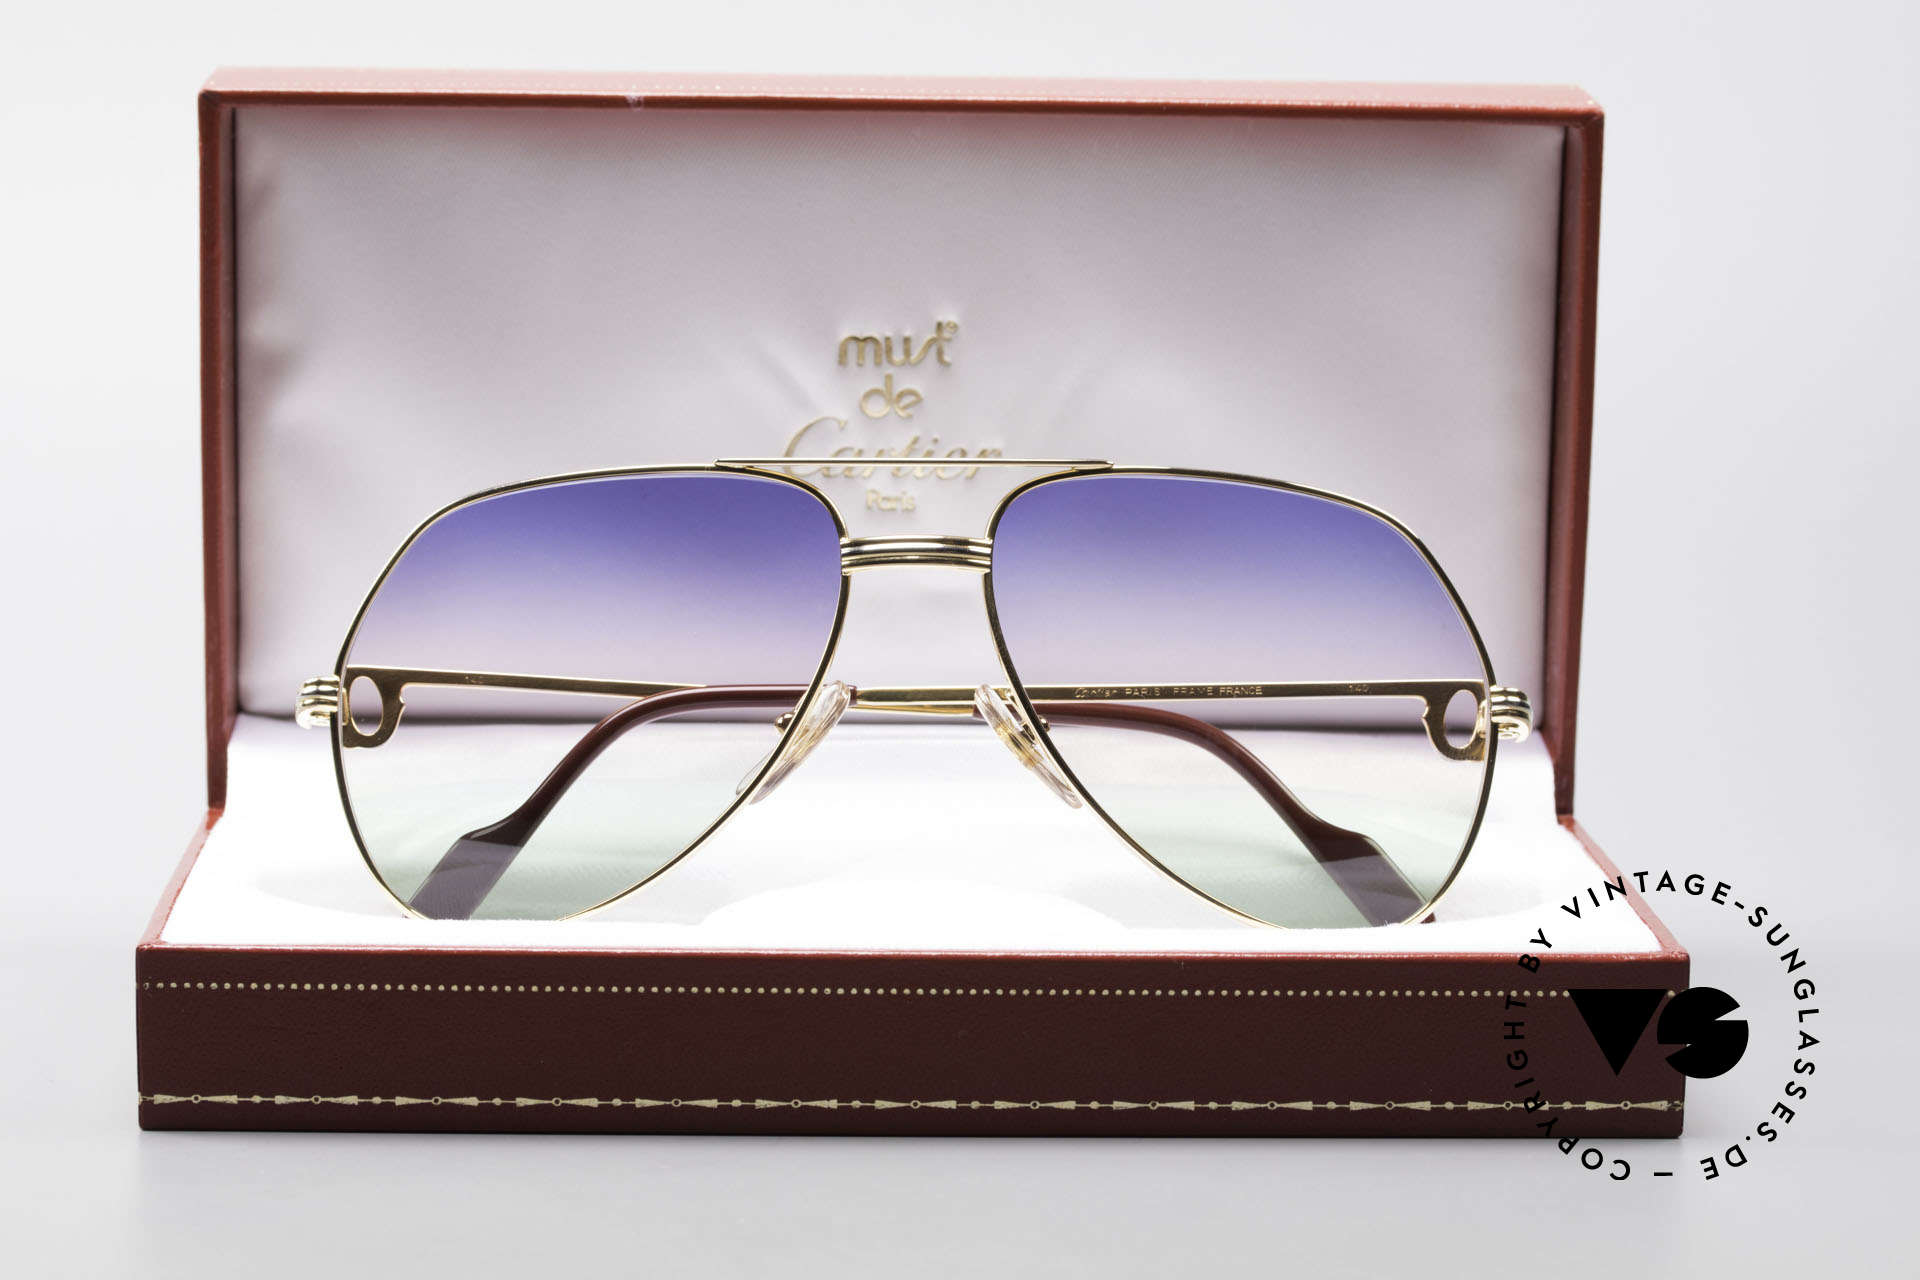 Cartier Vendome LC - M Michael Douglas Sunglasses, NO retro sunglasses, but an authentic vintage ORIGINAL, Made for Men